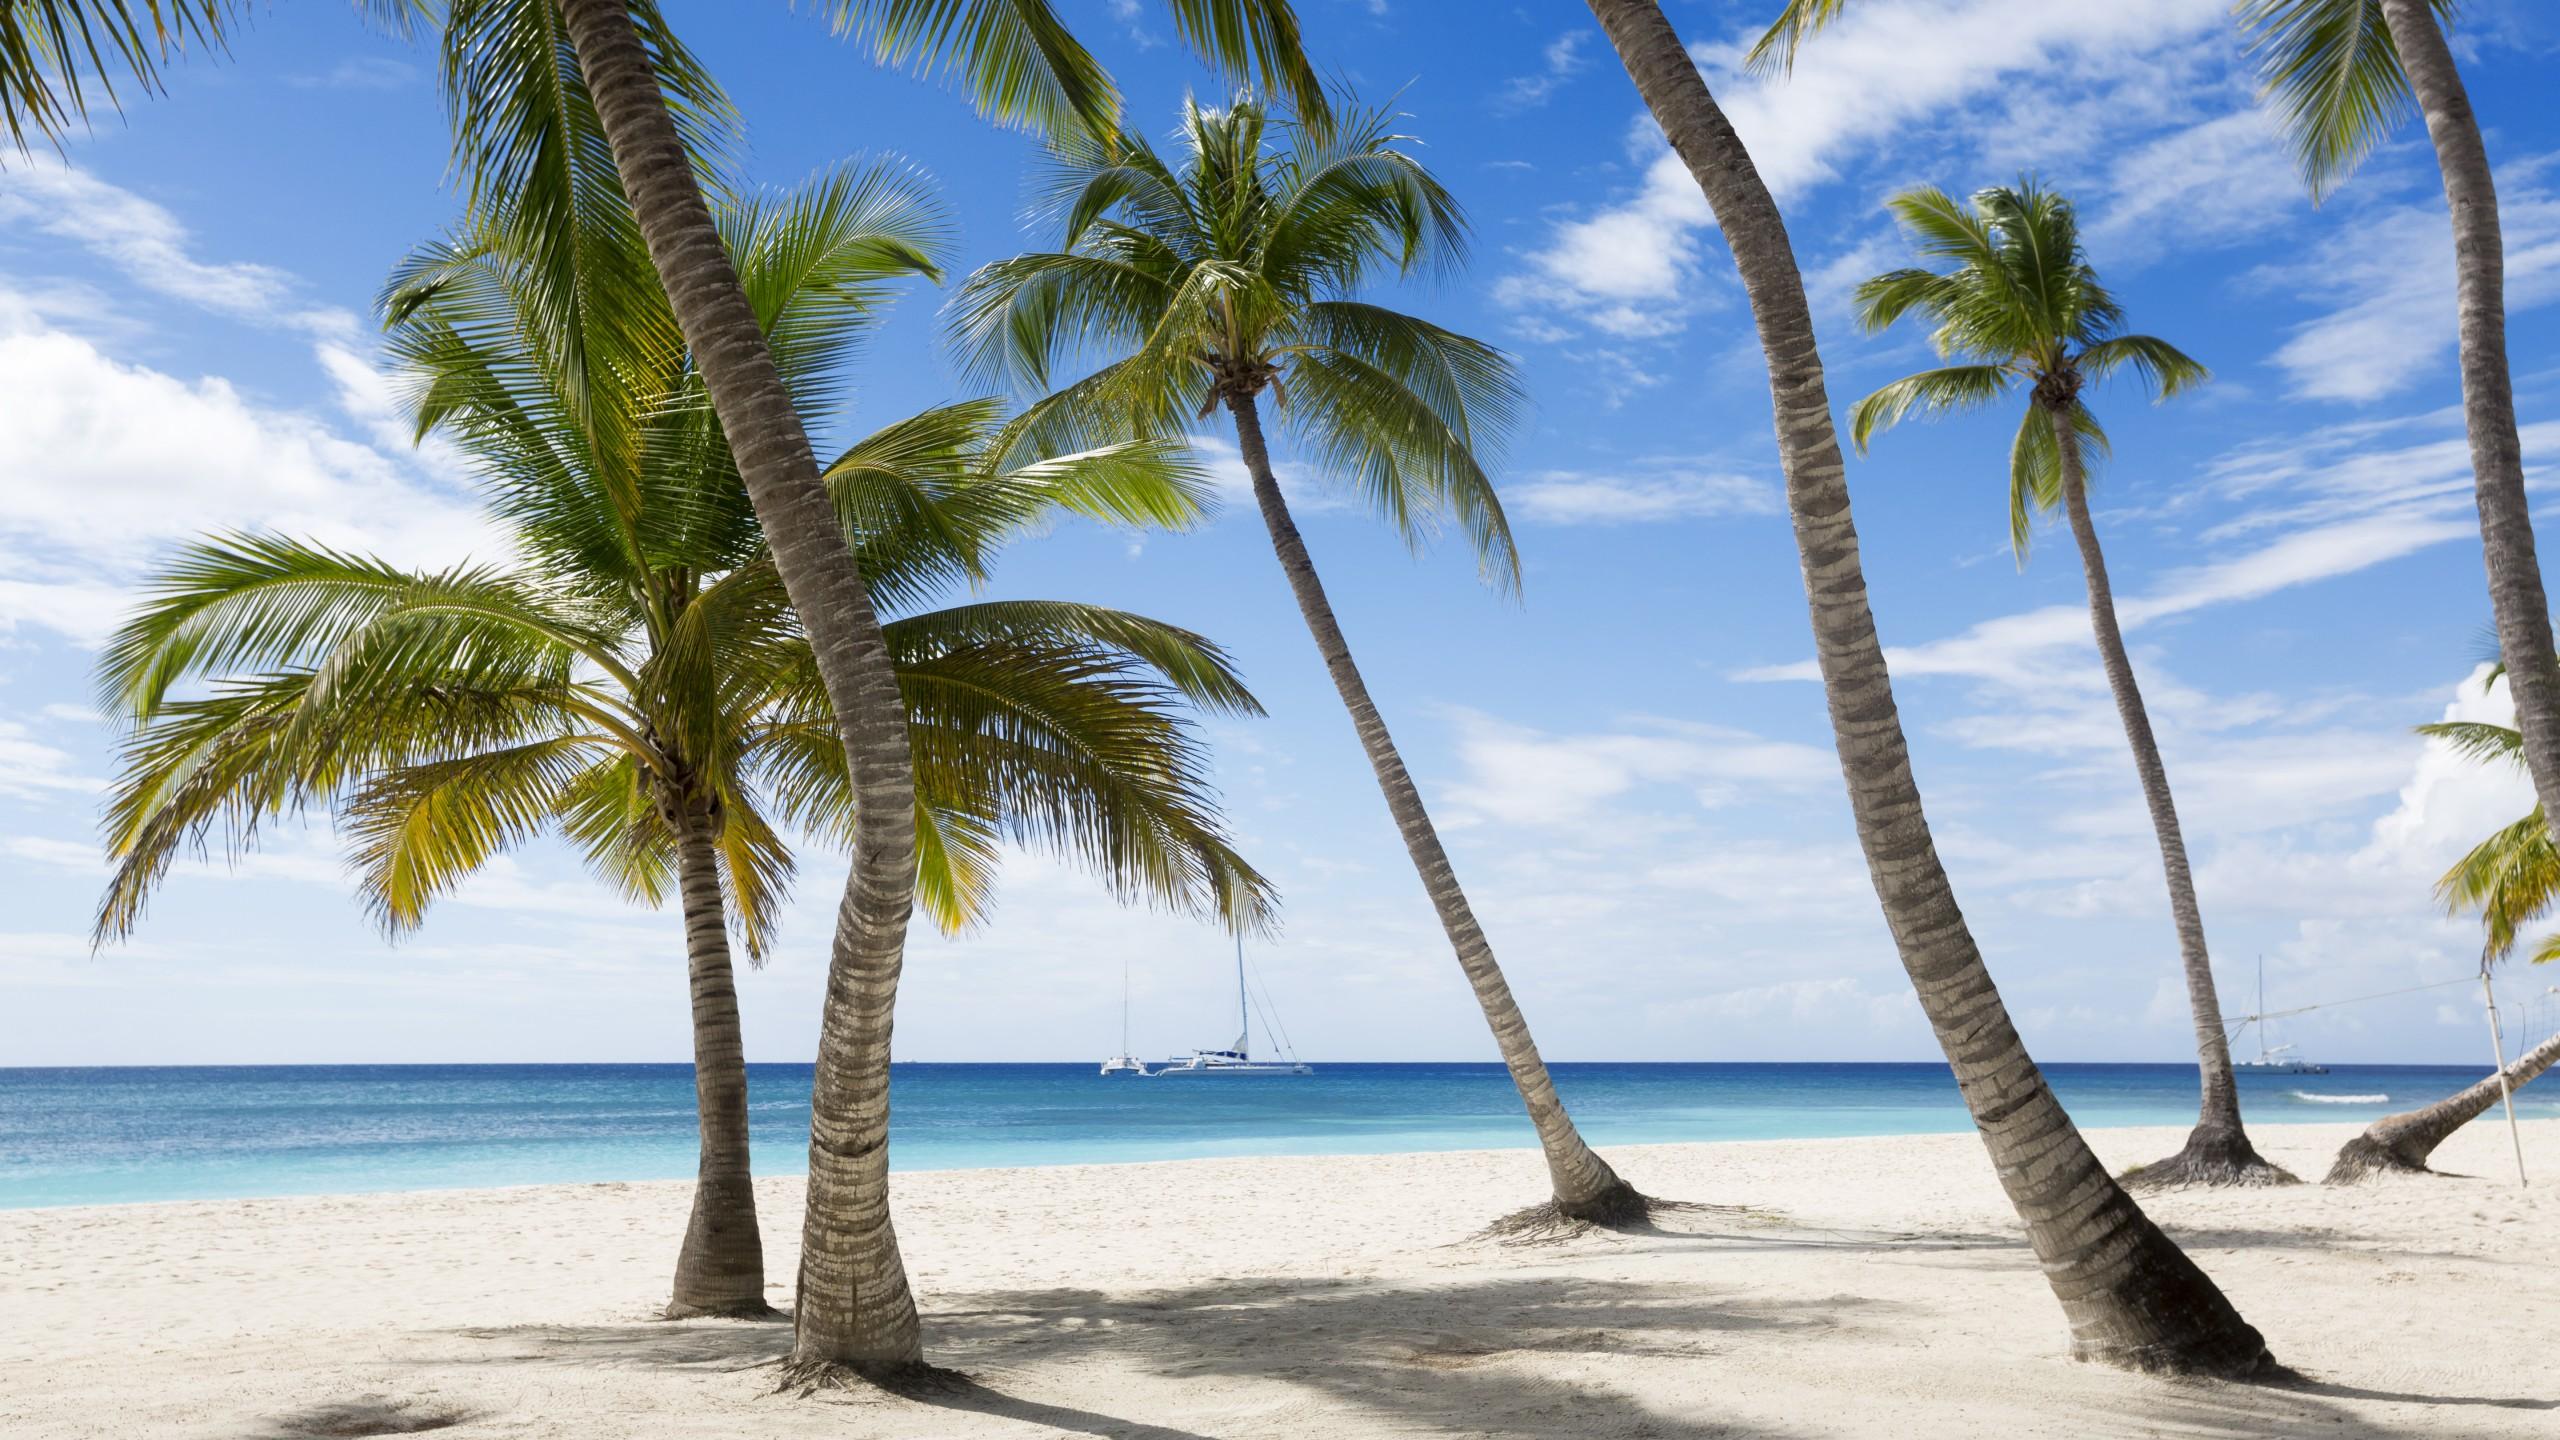 wallpaper jamaika, 5k, 4k wallpaper, the caribbean, beach, palms